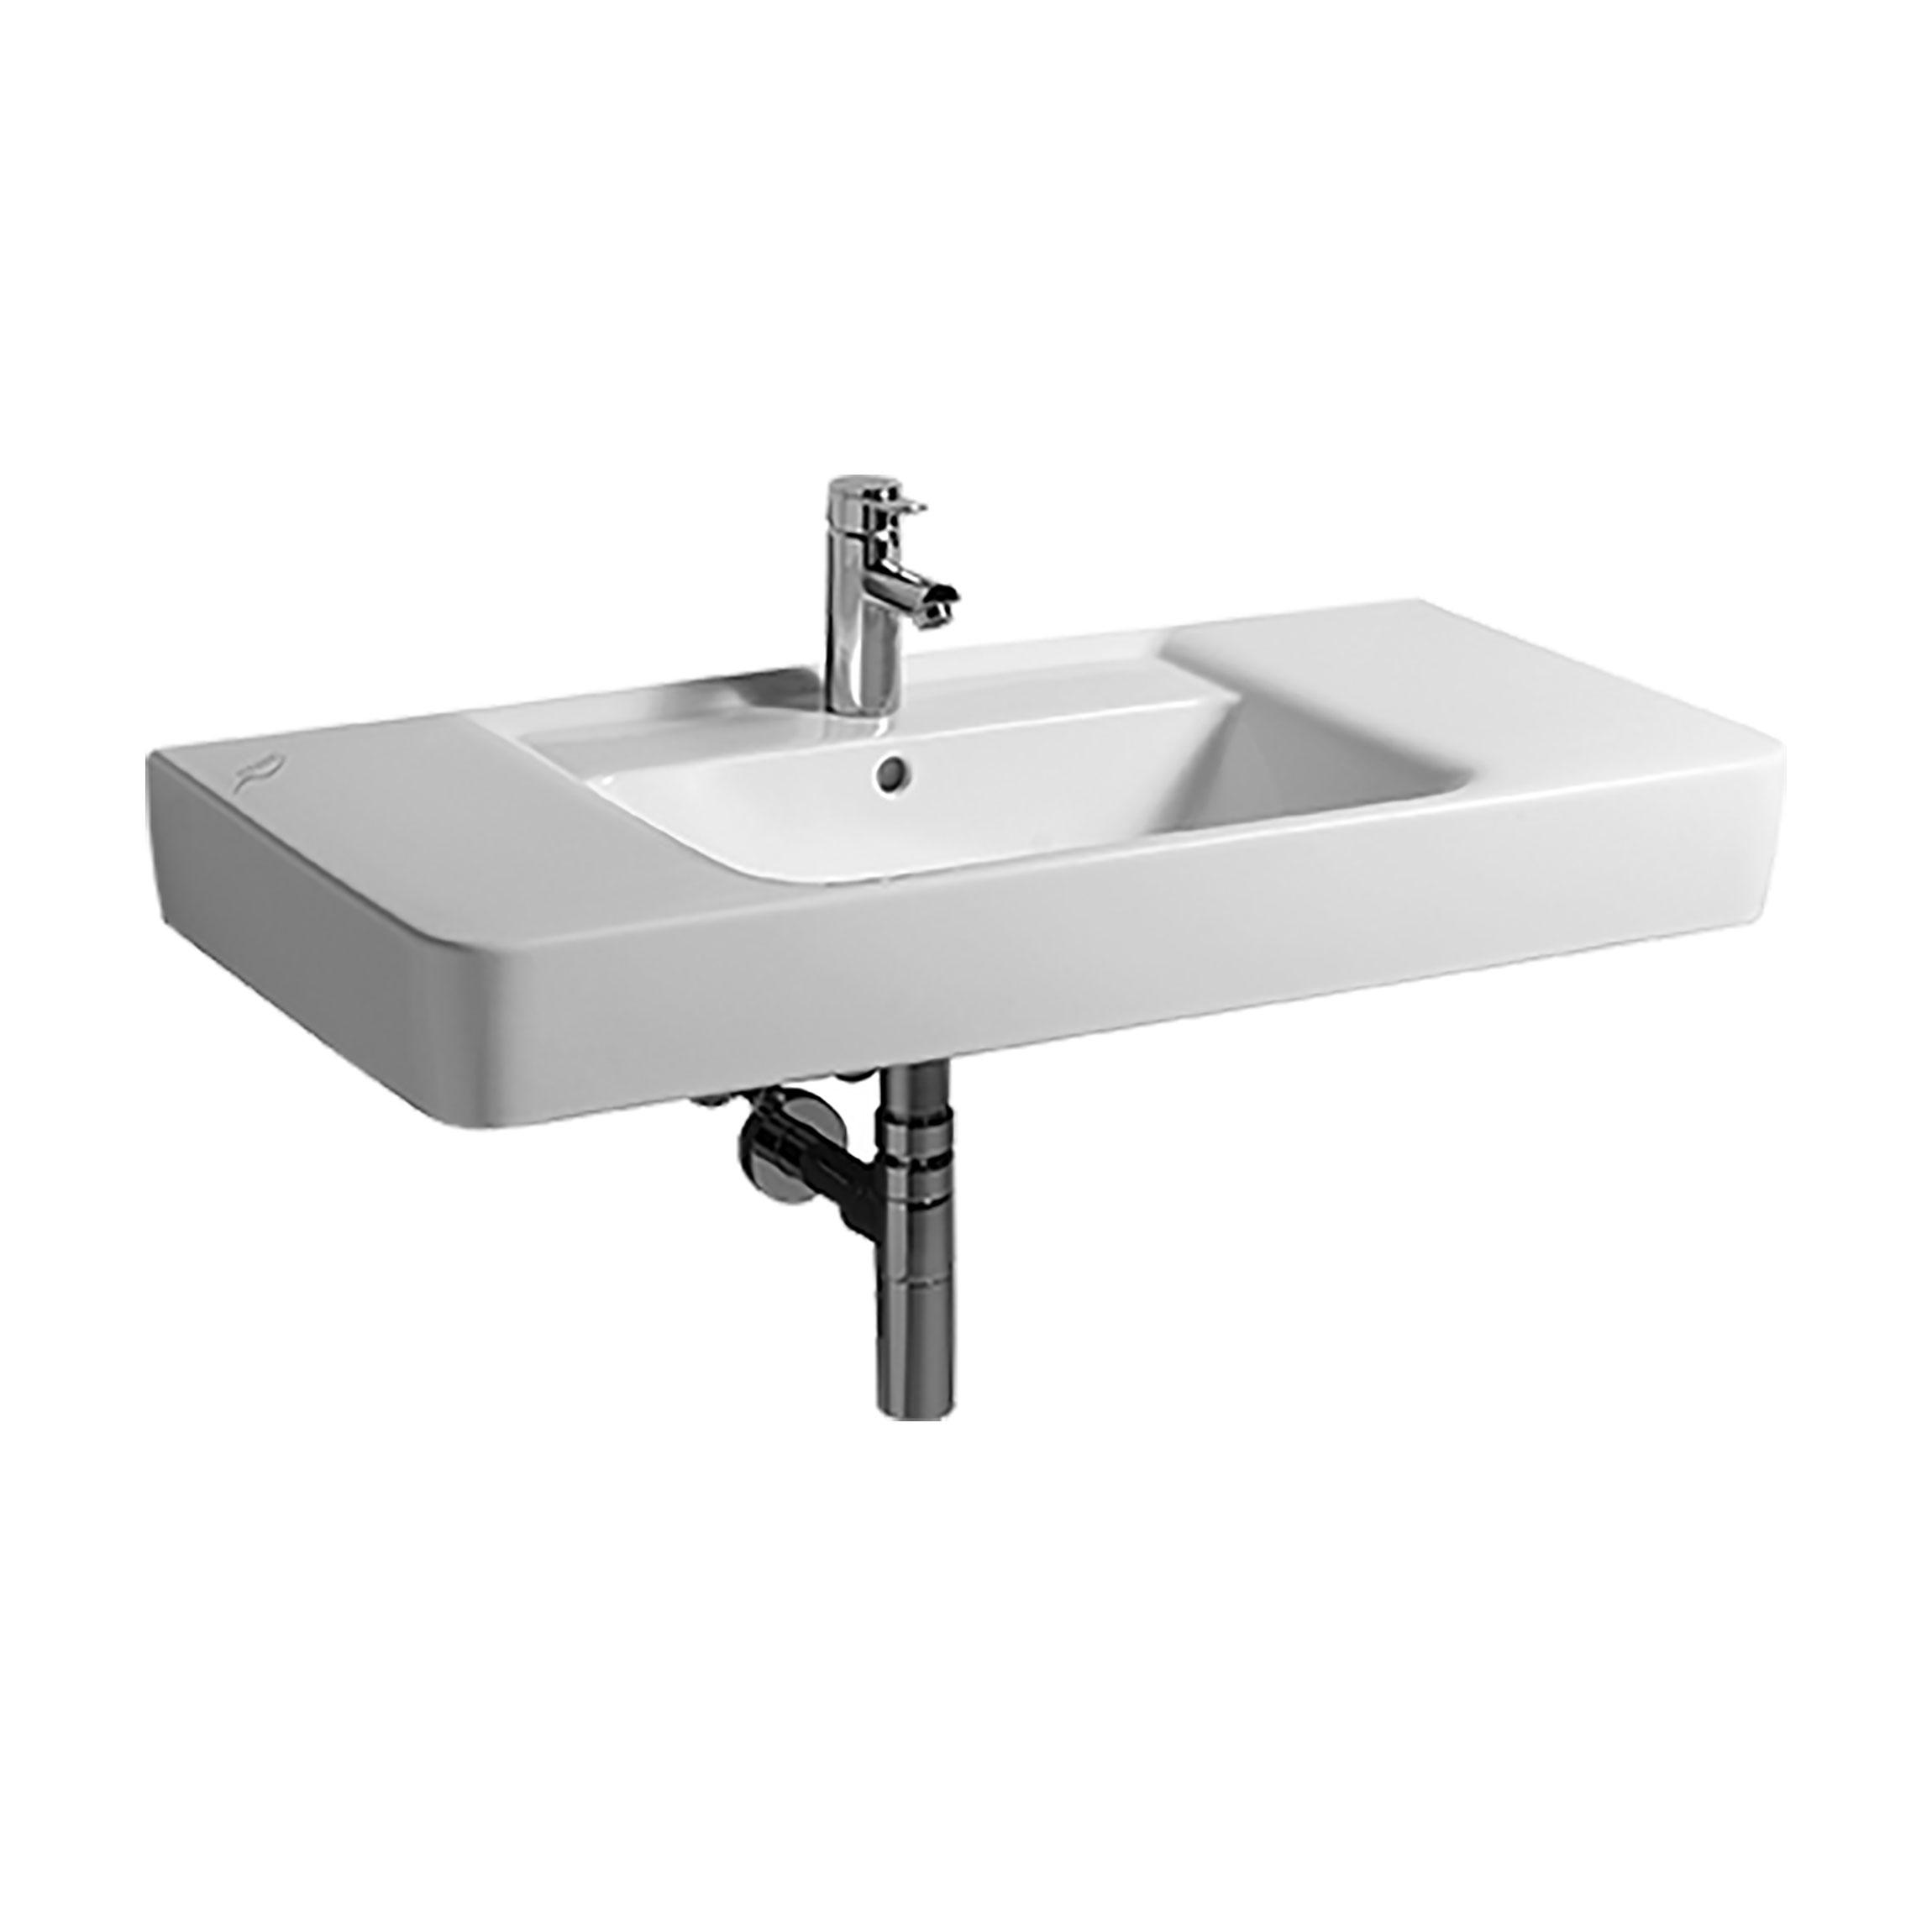 Tvättställ Ifö Renova 480 mm Infälld